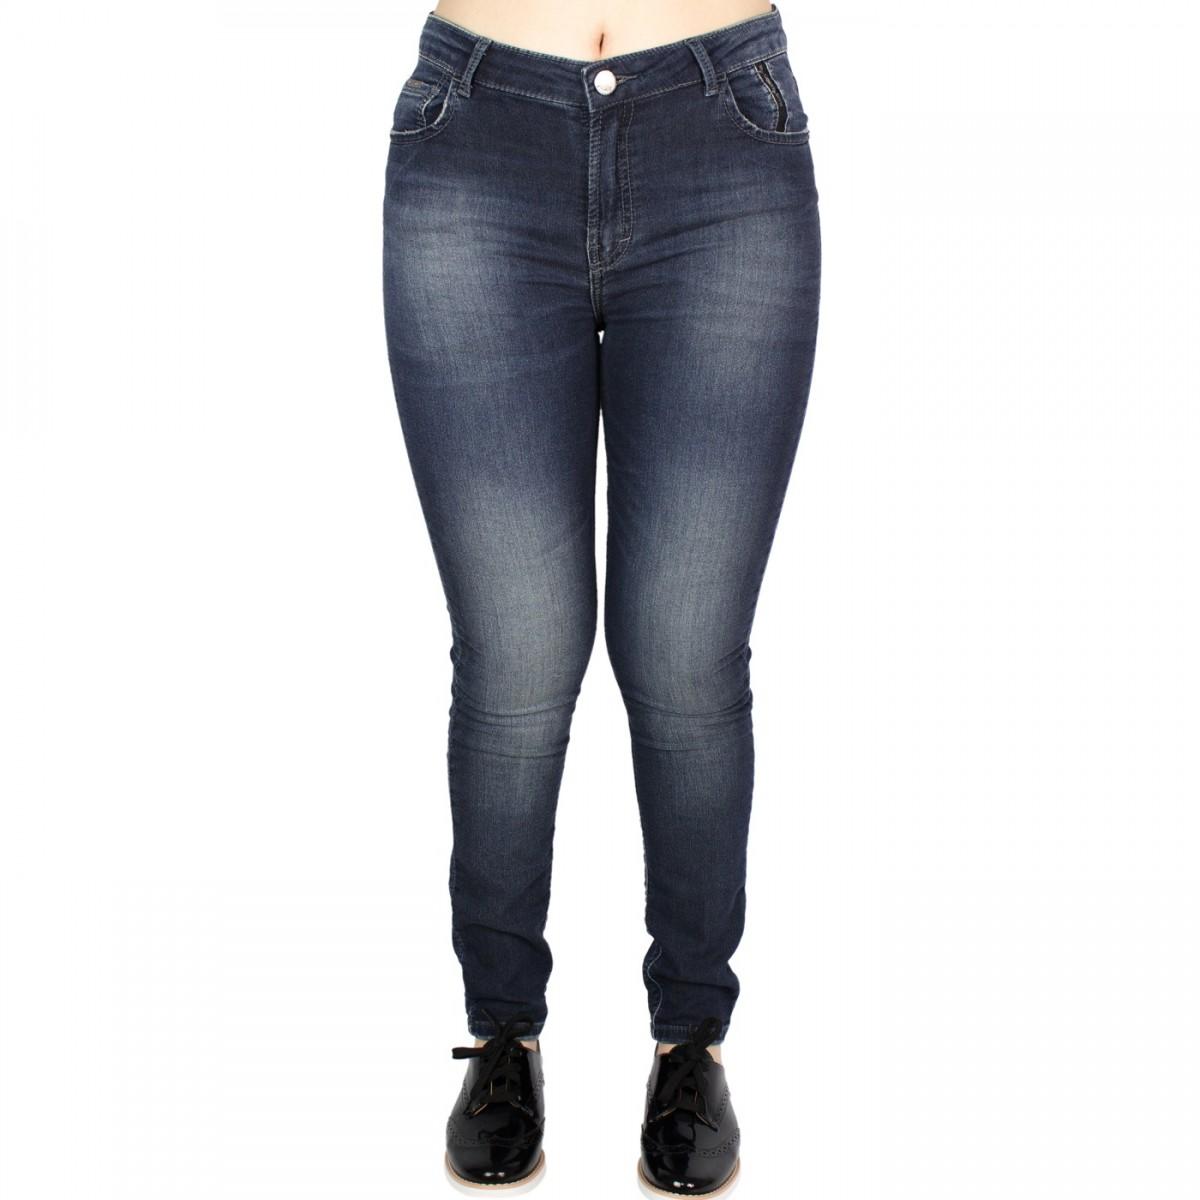 d78bc6f2a Bizz Store - Calça Jeans Ellus Second Floor Charlote Skinny